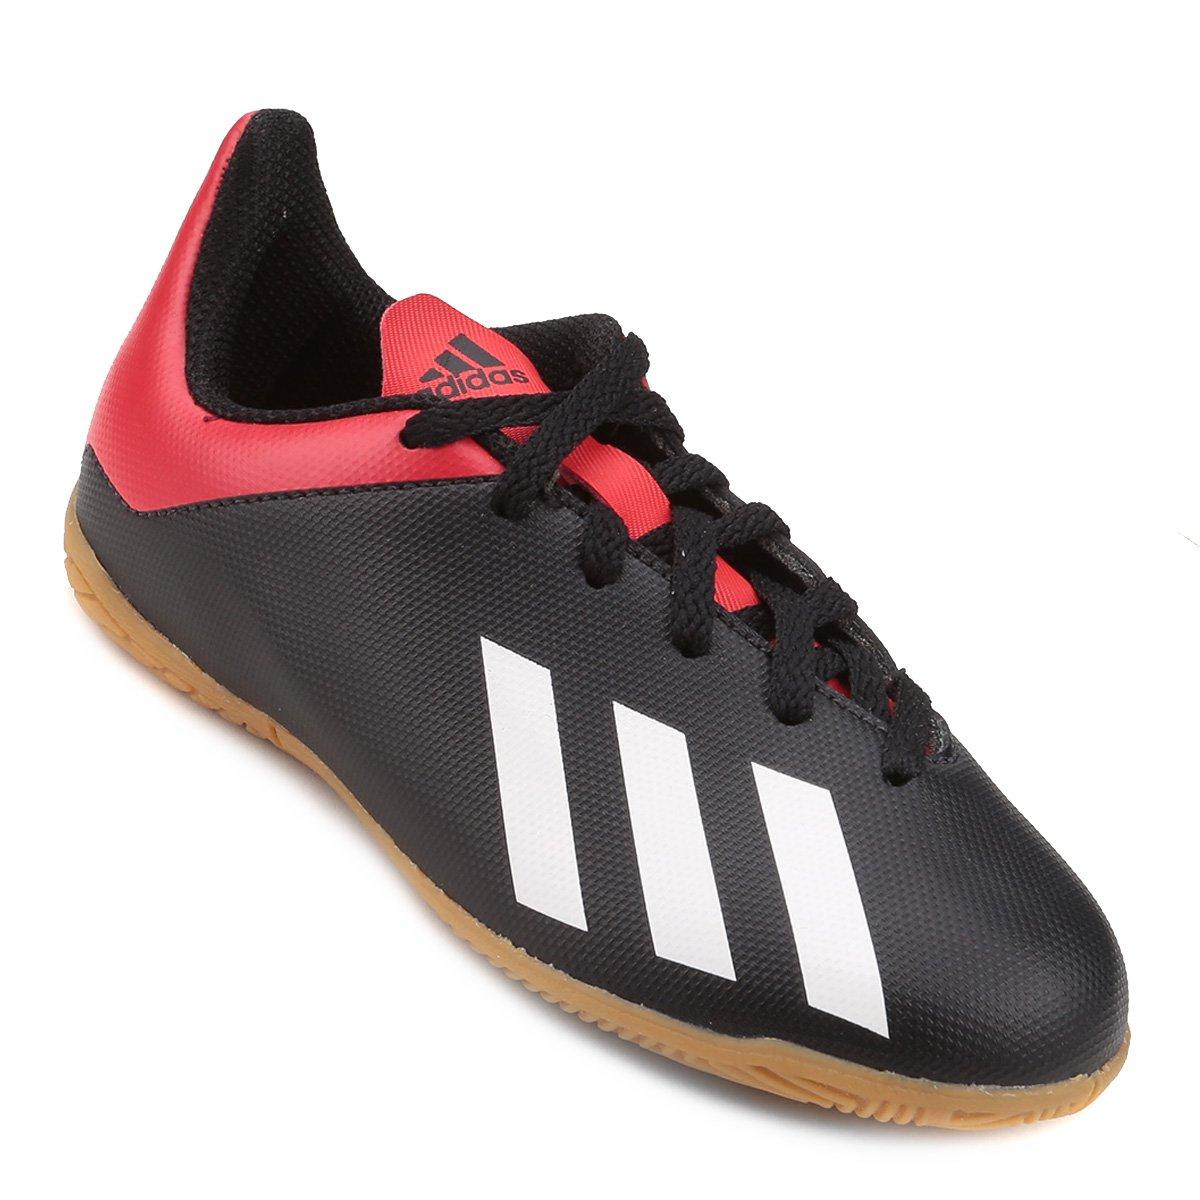 50ca387c7f1 Chuteira Futsal Infantil Adidas X 18 4 IN - Compre Agora